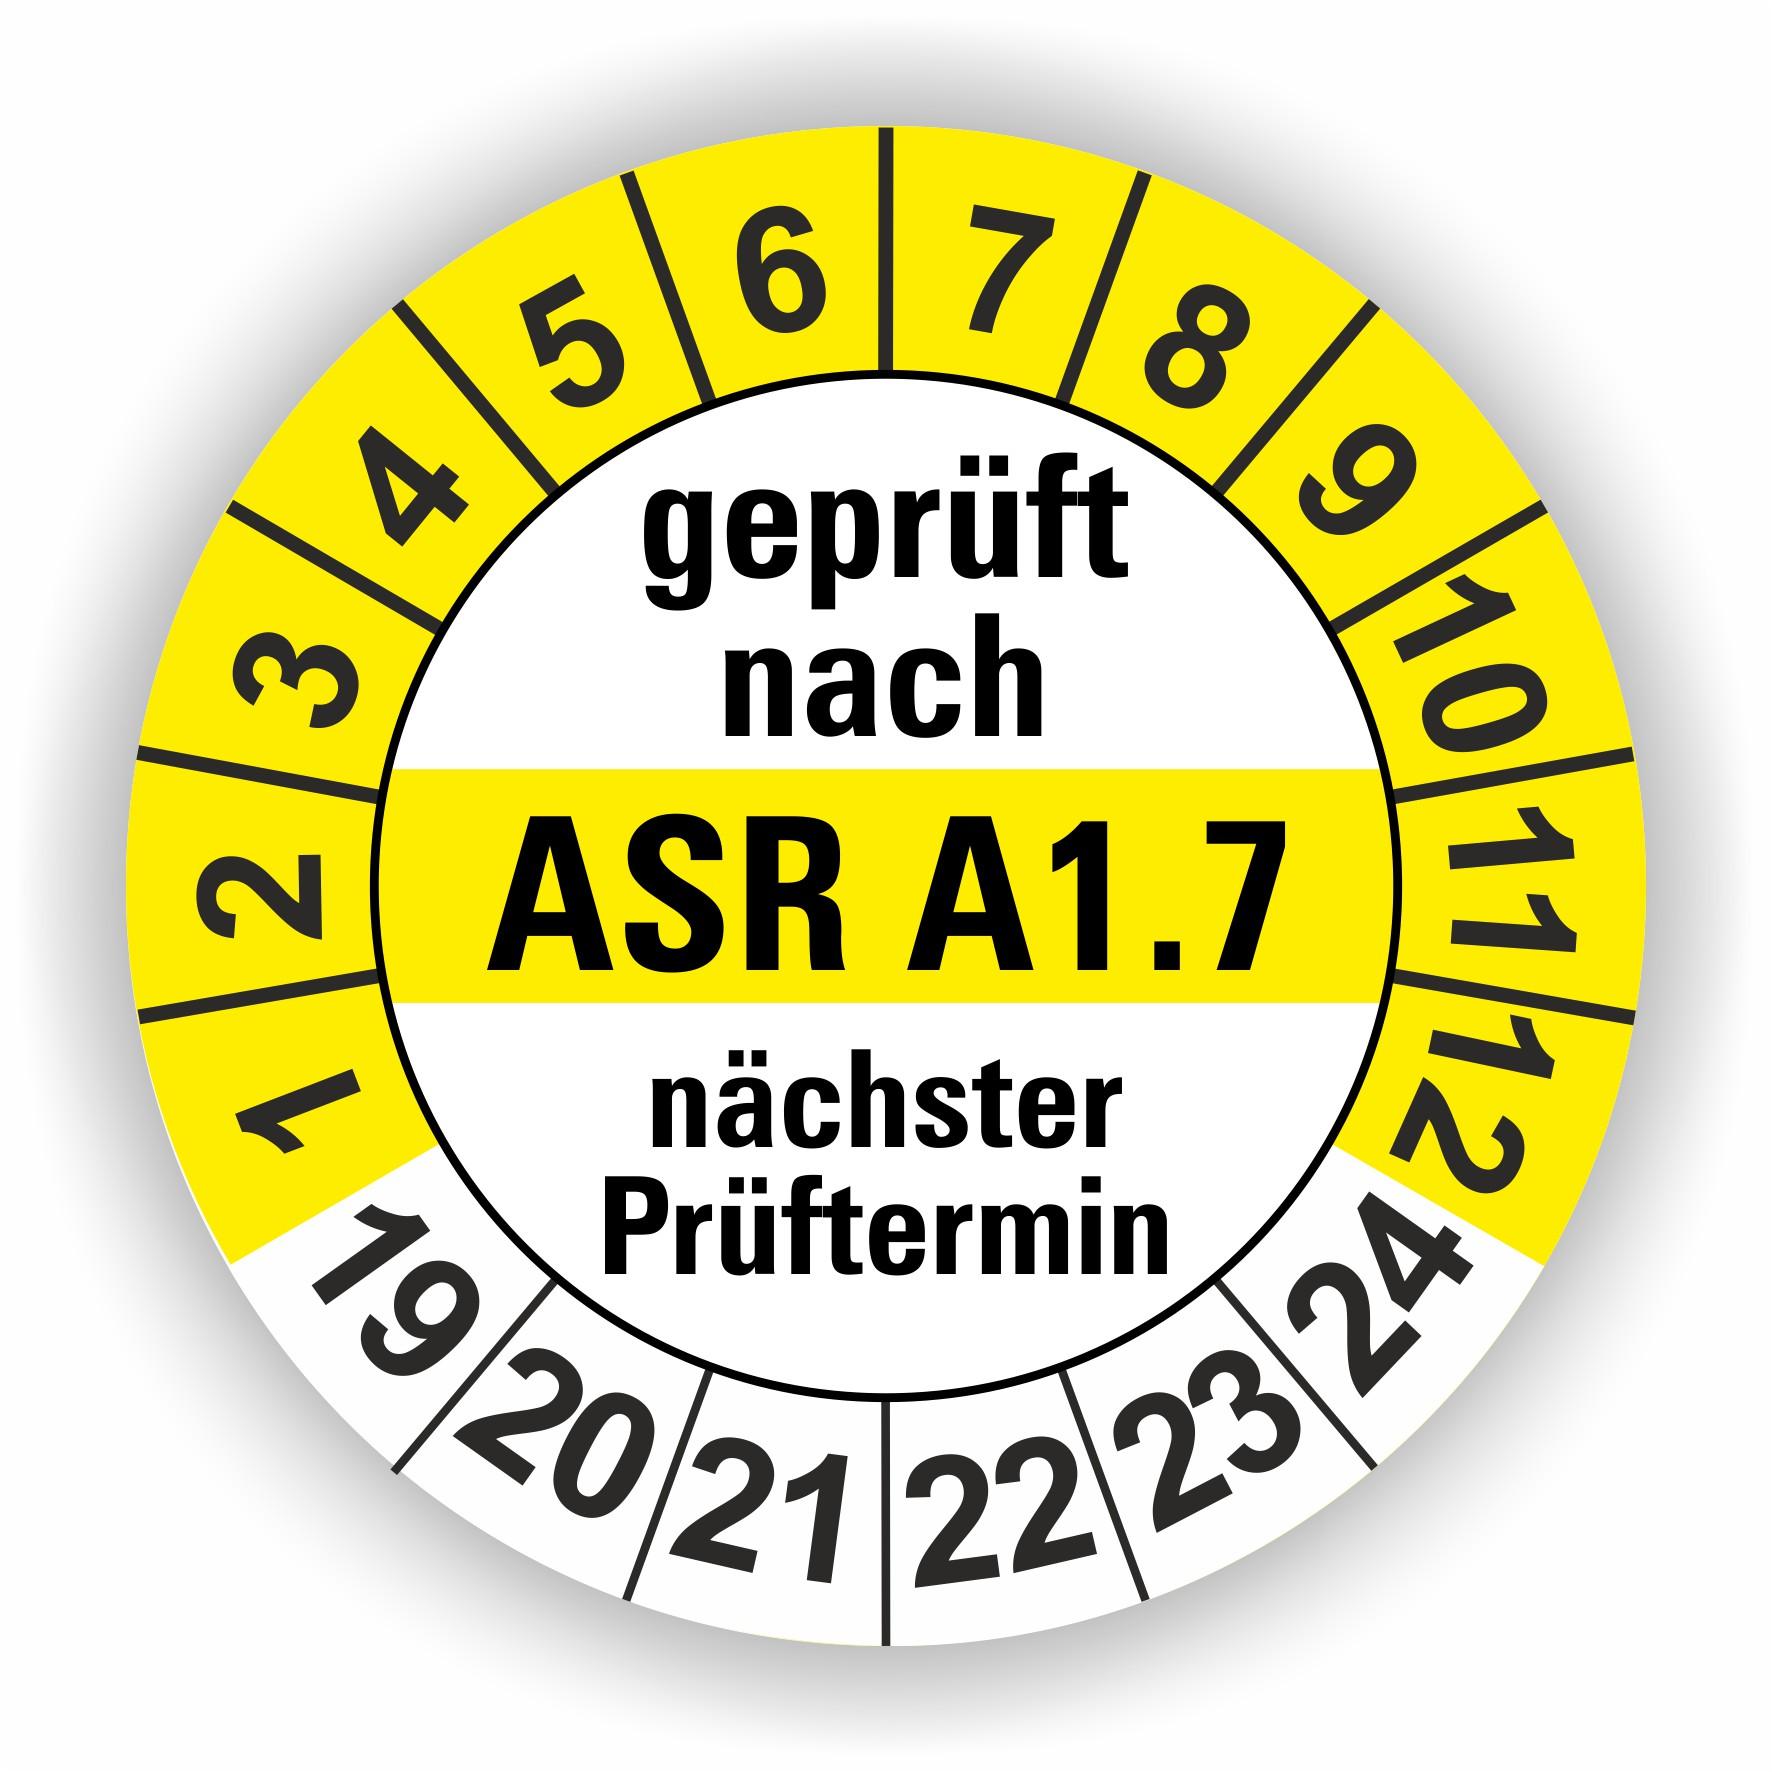 Ad7545jn mp7545jn 12 Bit DAC dip-20 Micro Power Systems